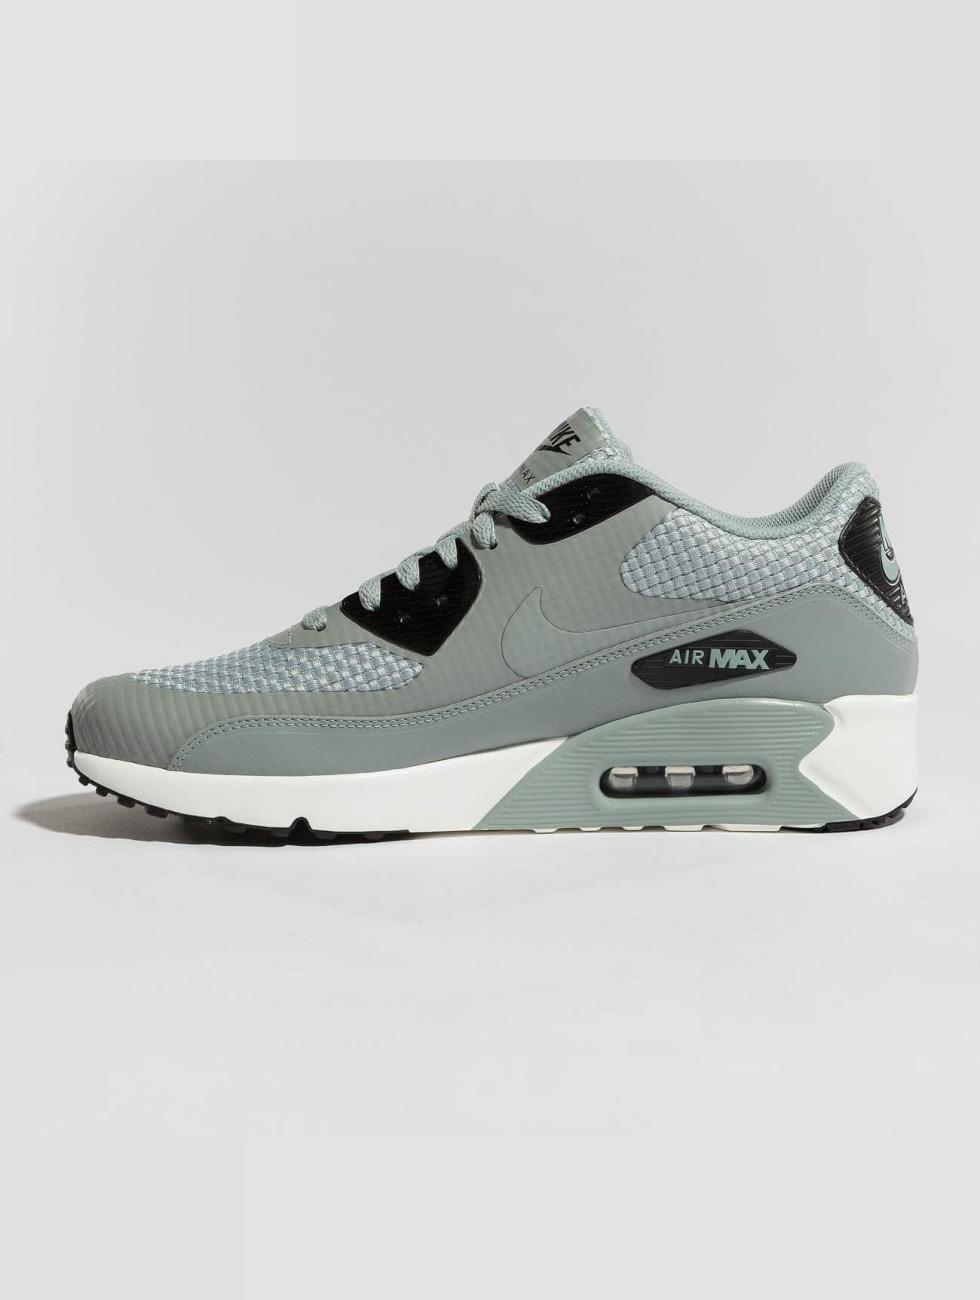 Klaring Laagste Prijs laatste Nike schoen / sneaker Air Max 90 Ultra 2.0 SE in grijs 442392 TJcunGn